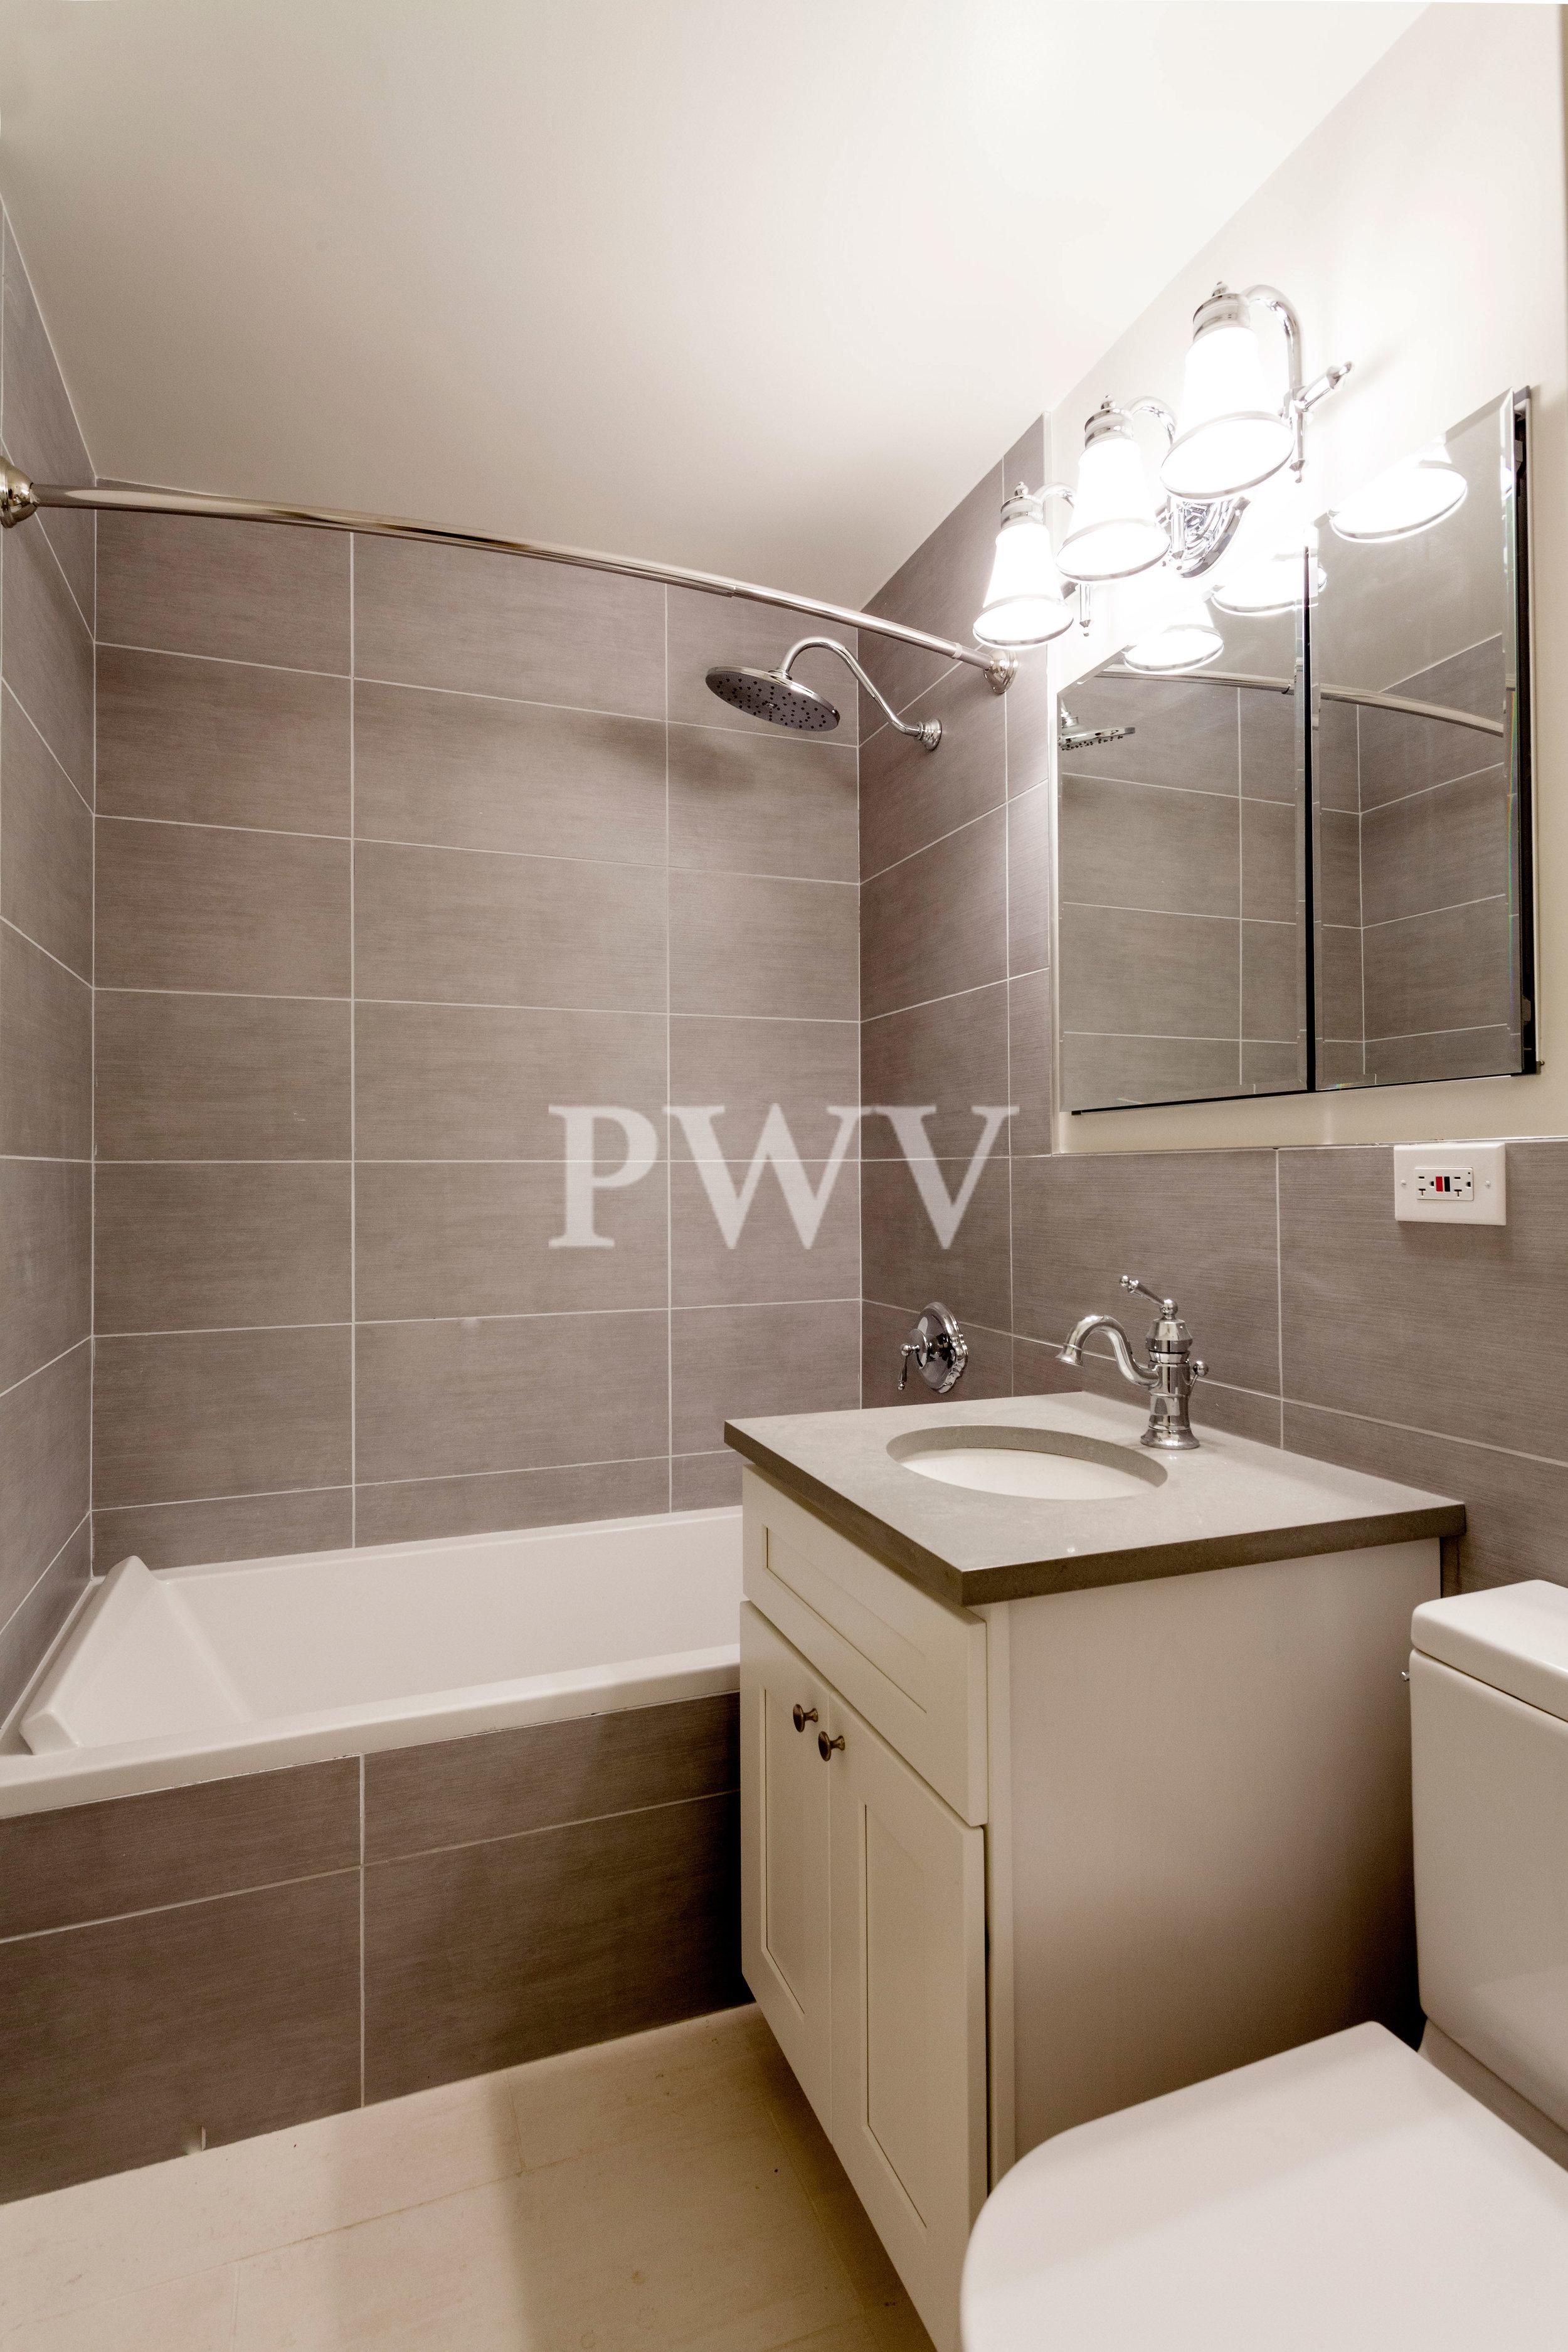 784-14n-Bath.jpg